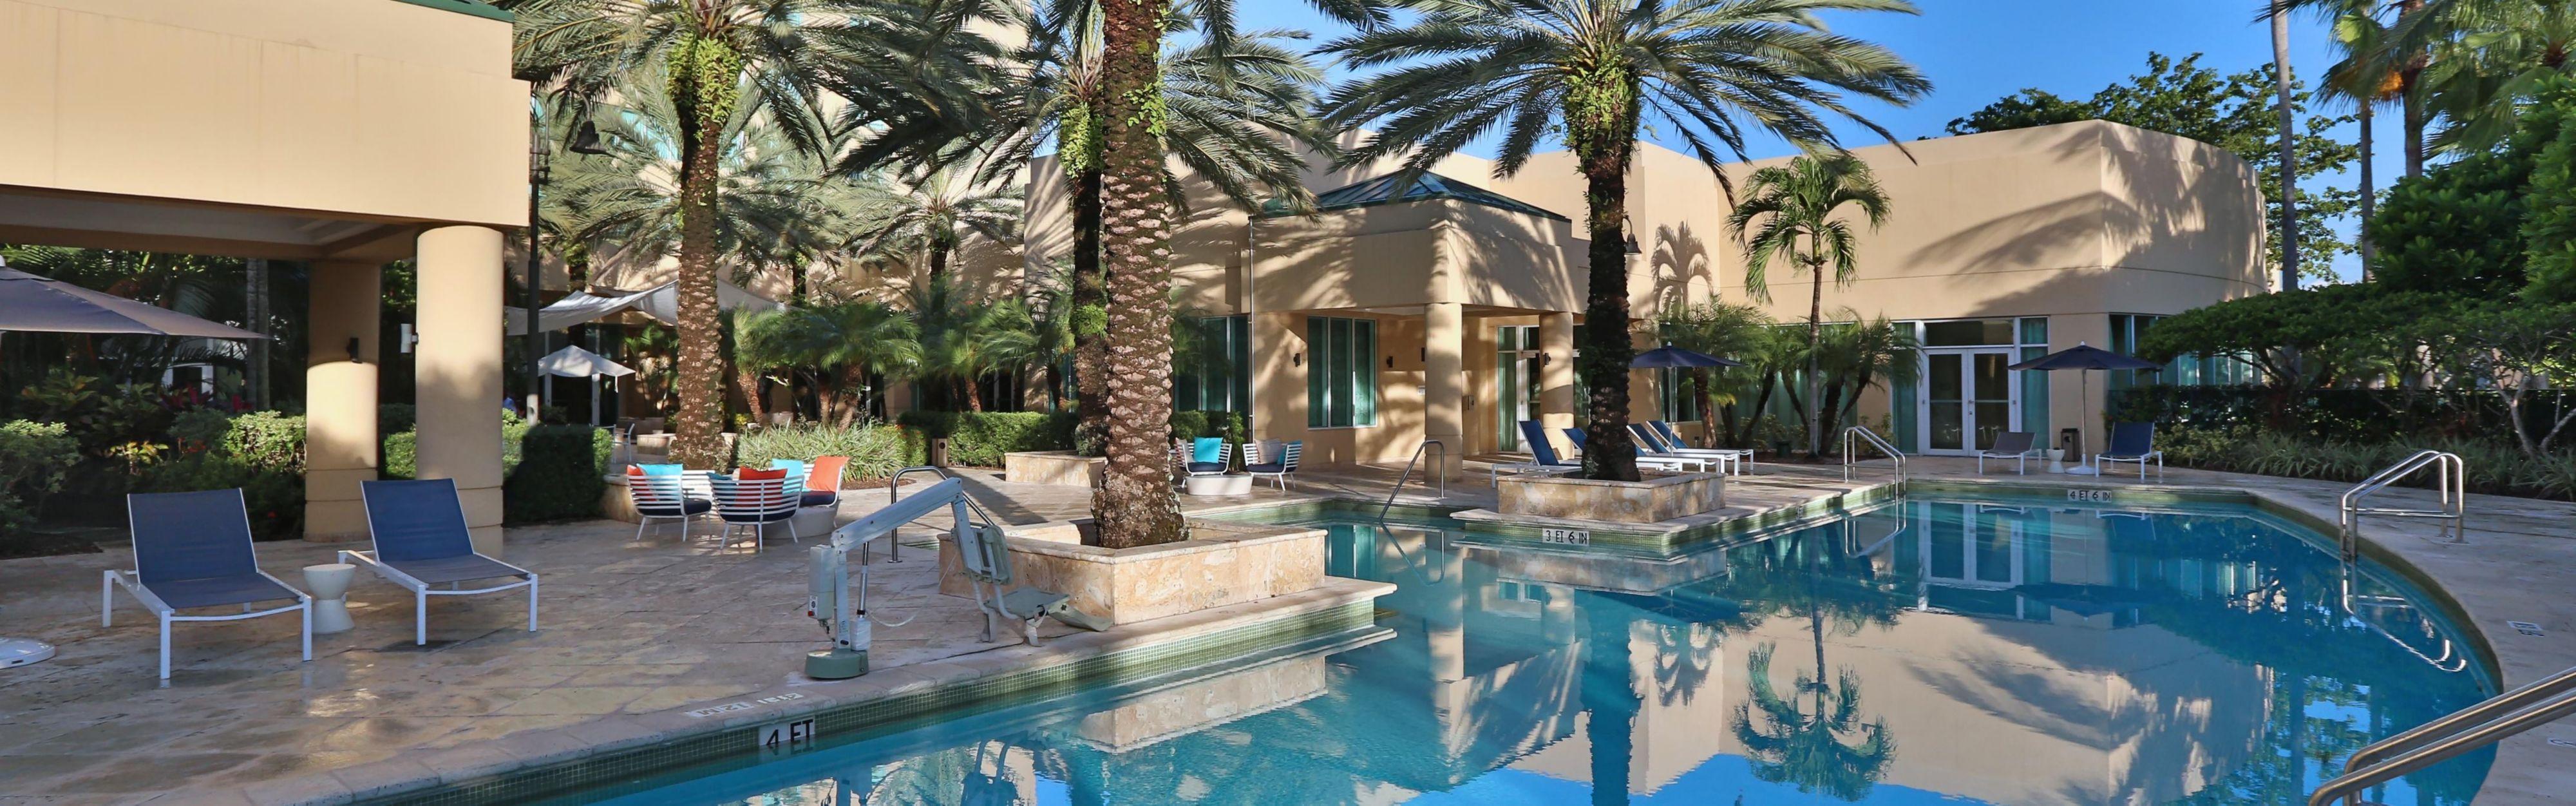 Hotels Near Dolphin Mall And Miami International Mall